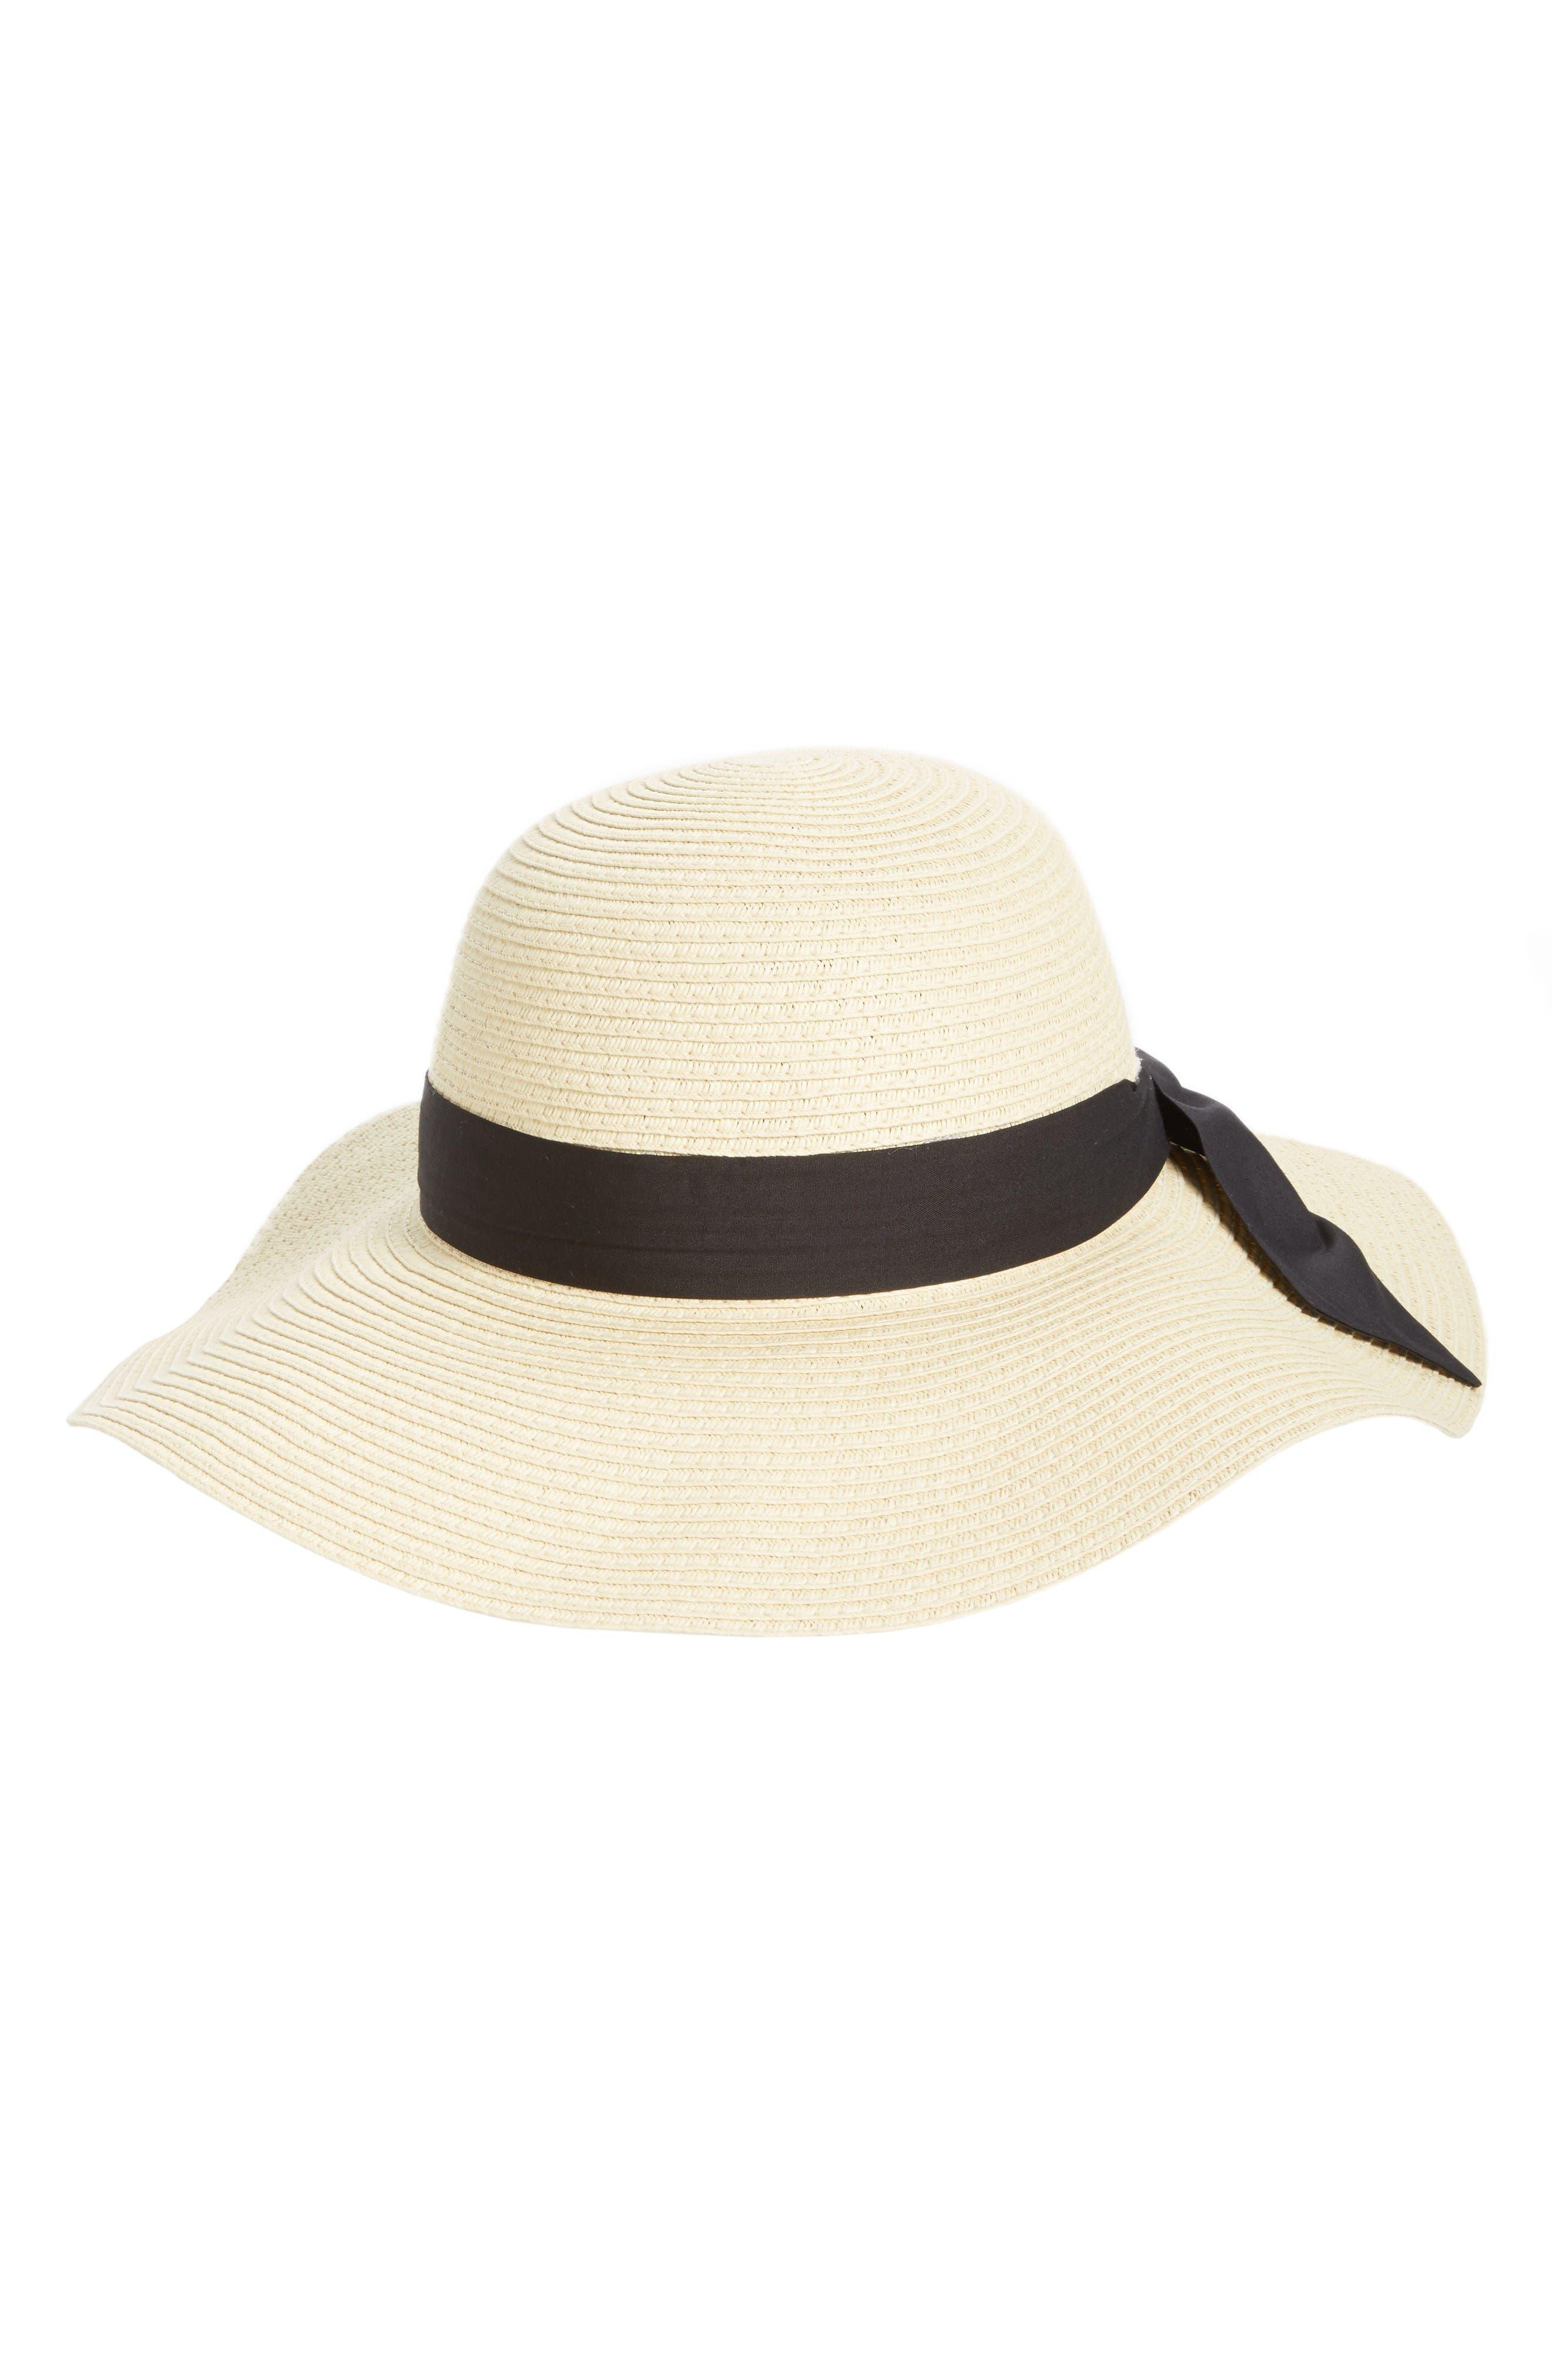 BP. Bow Band Floppy Straw Hat